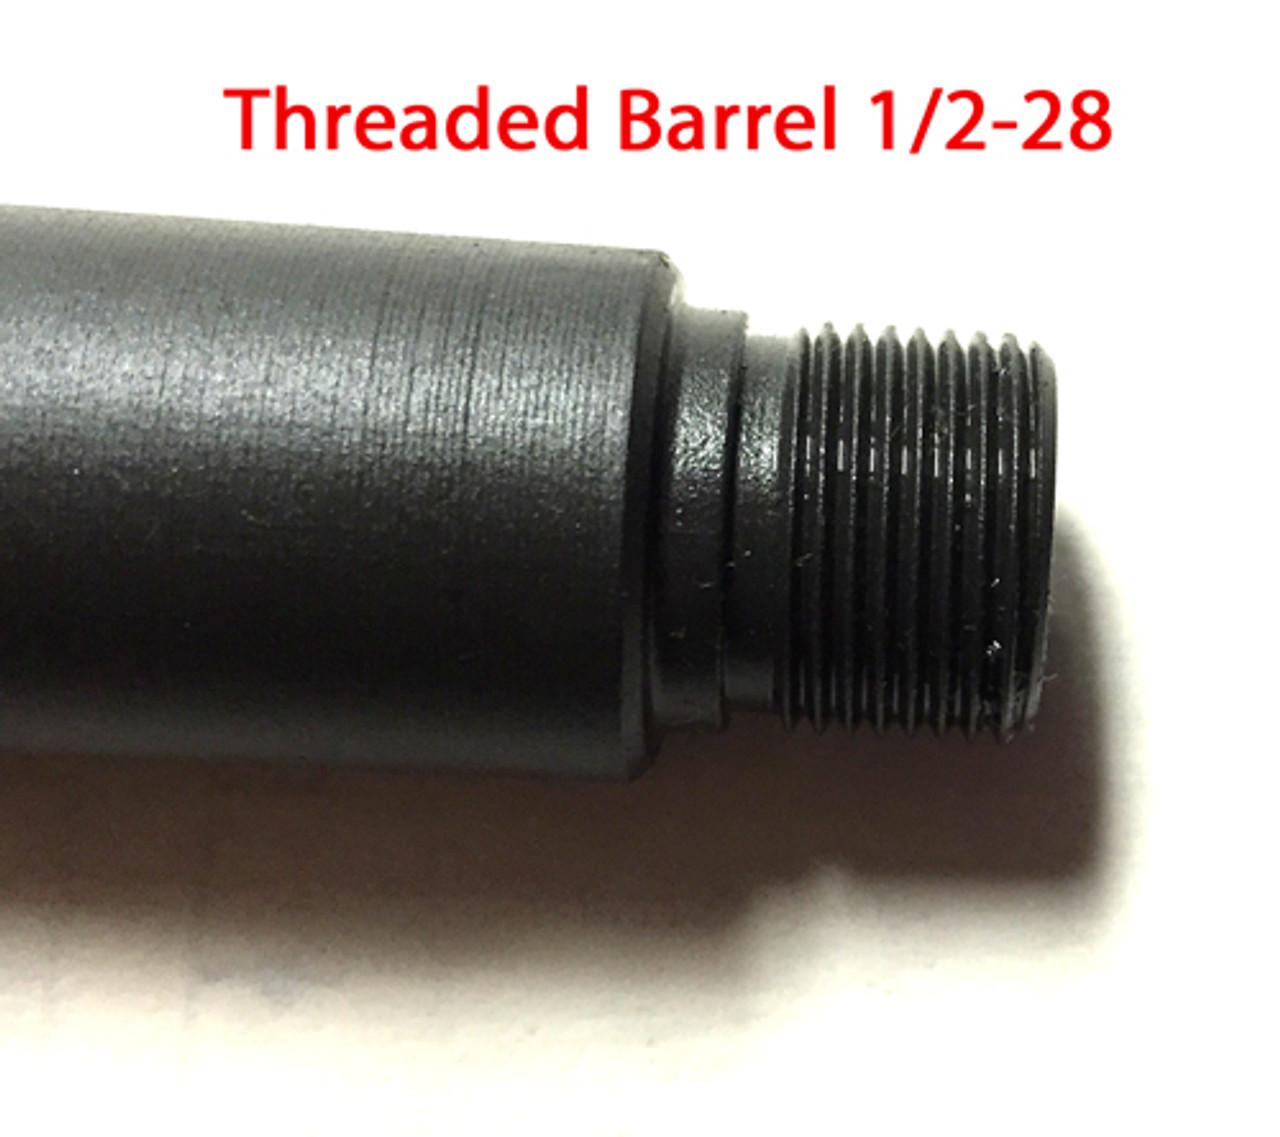 "Stemple STG 9mm Barrel 16"" Threaded 1/2-28"